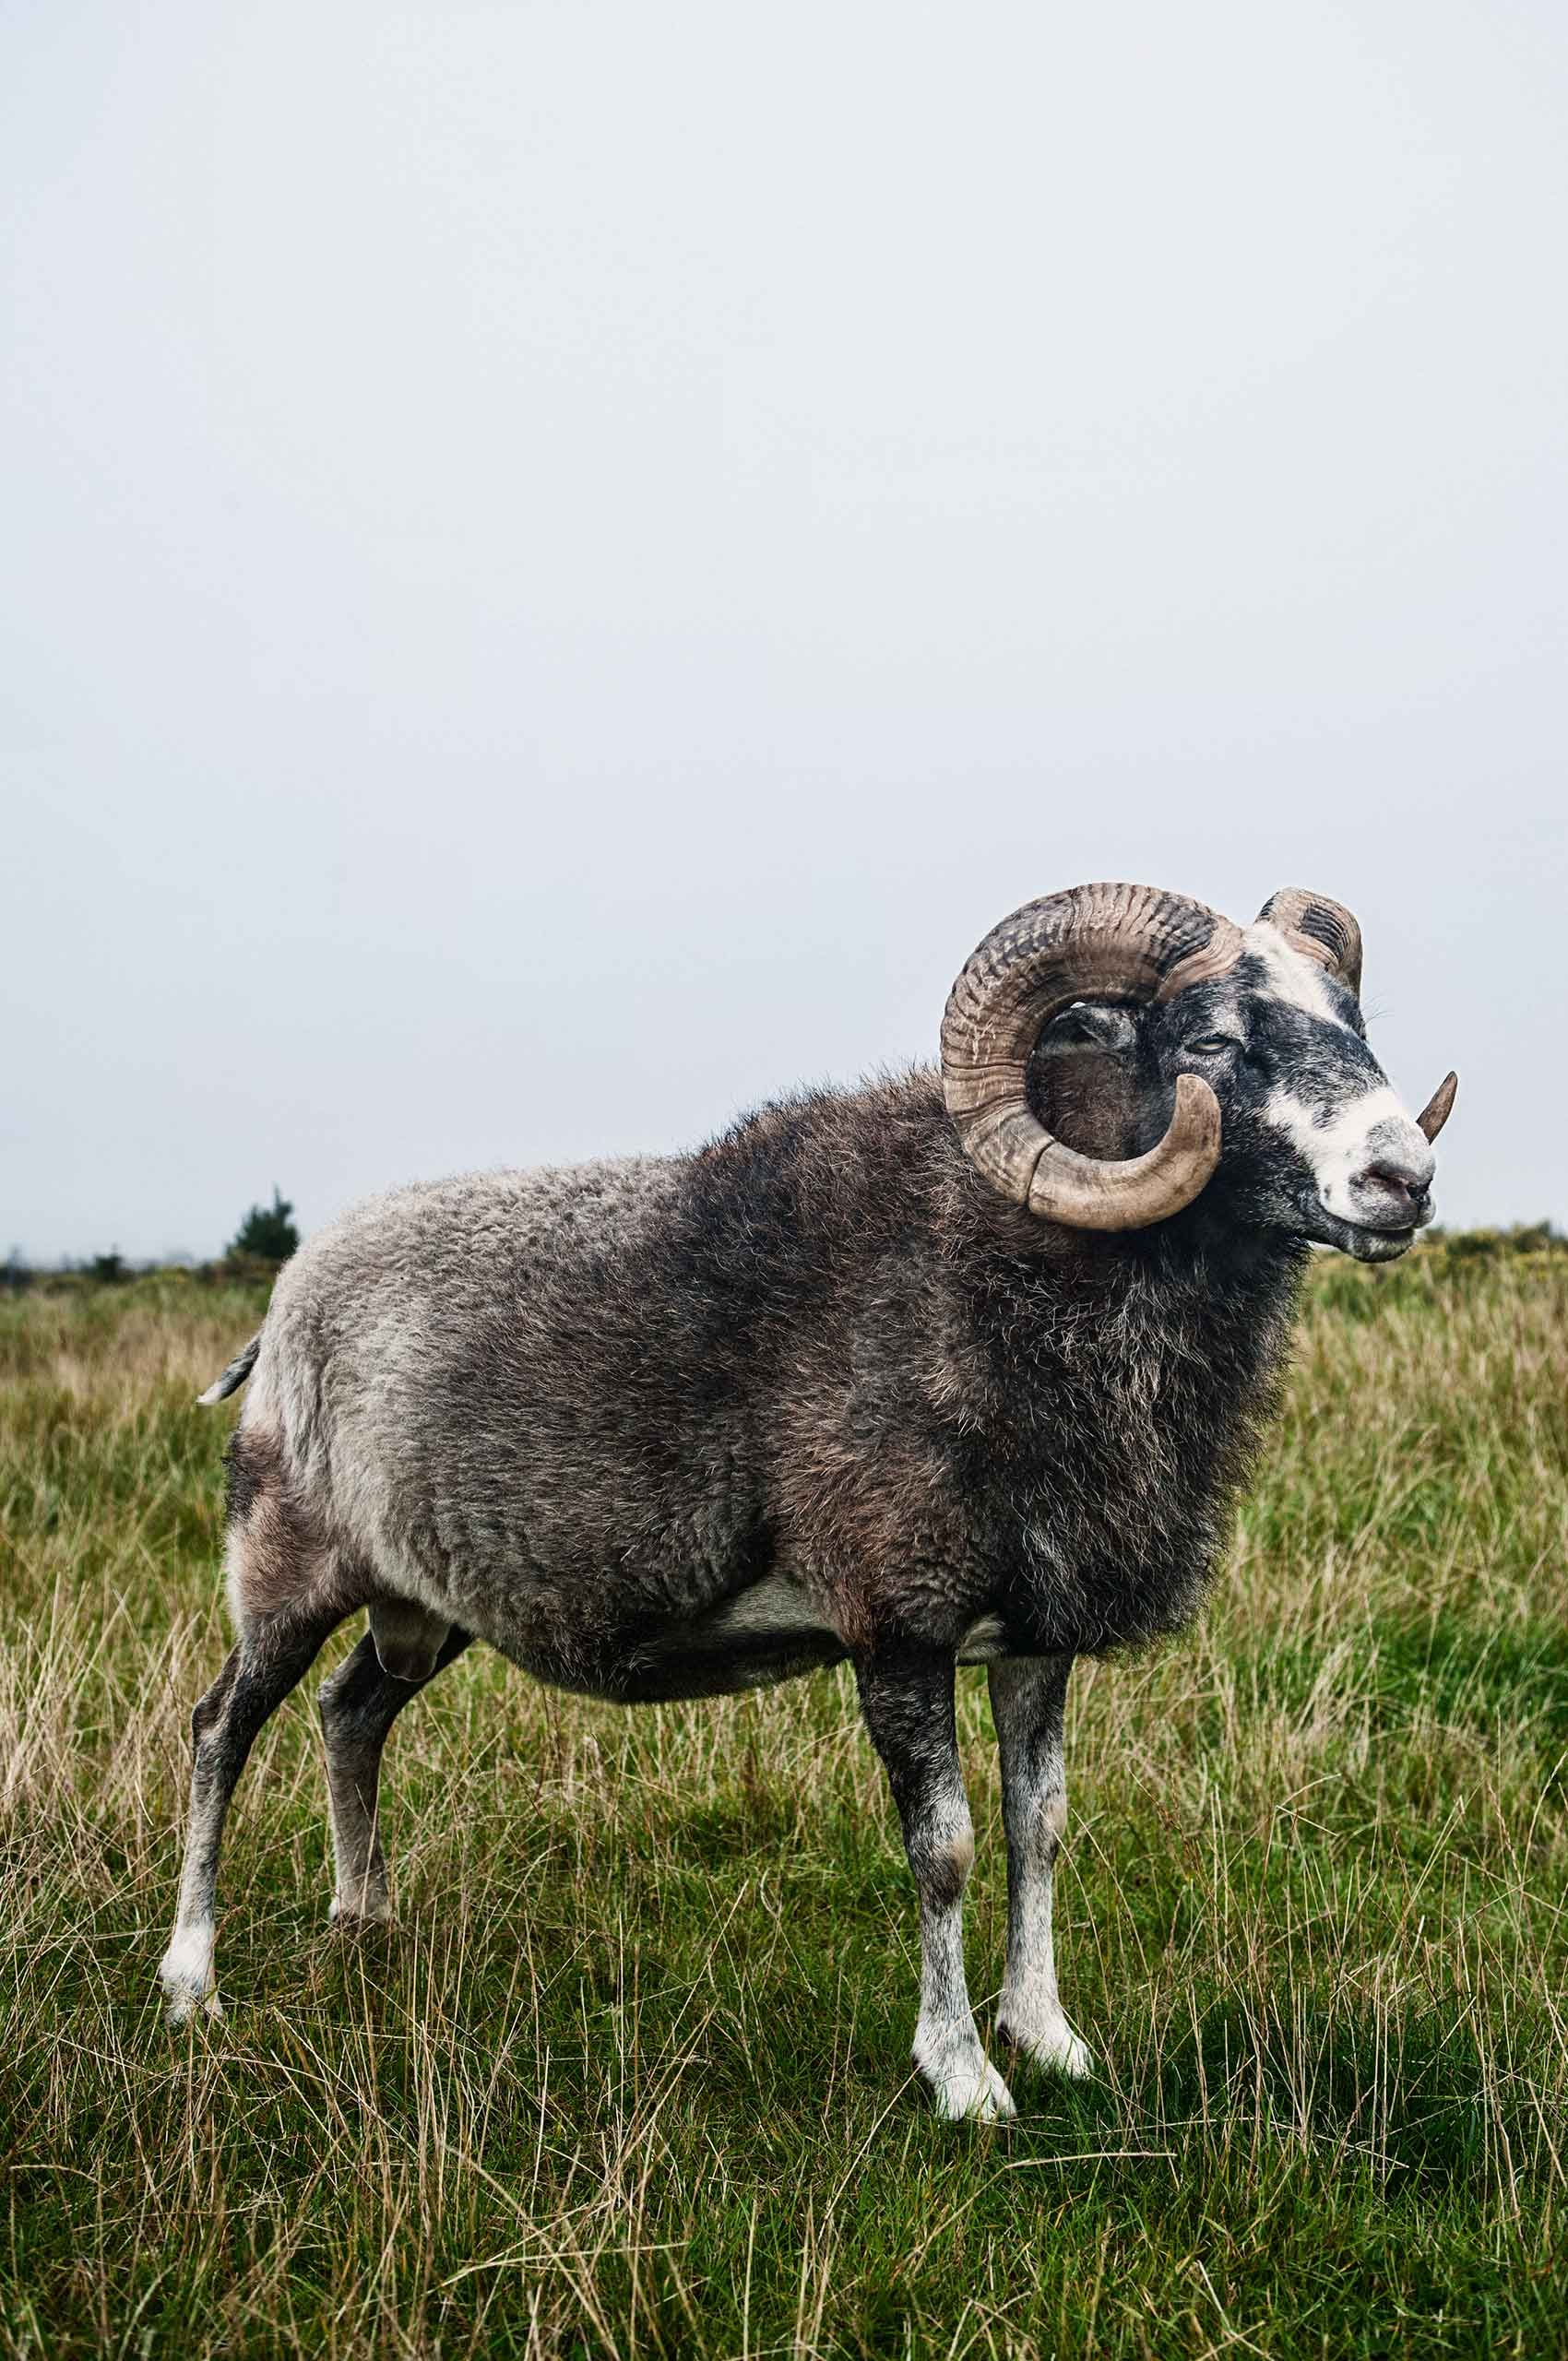 swedish-goat-bock-by-HenrikOlundPhotography.jpg